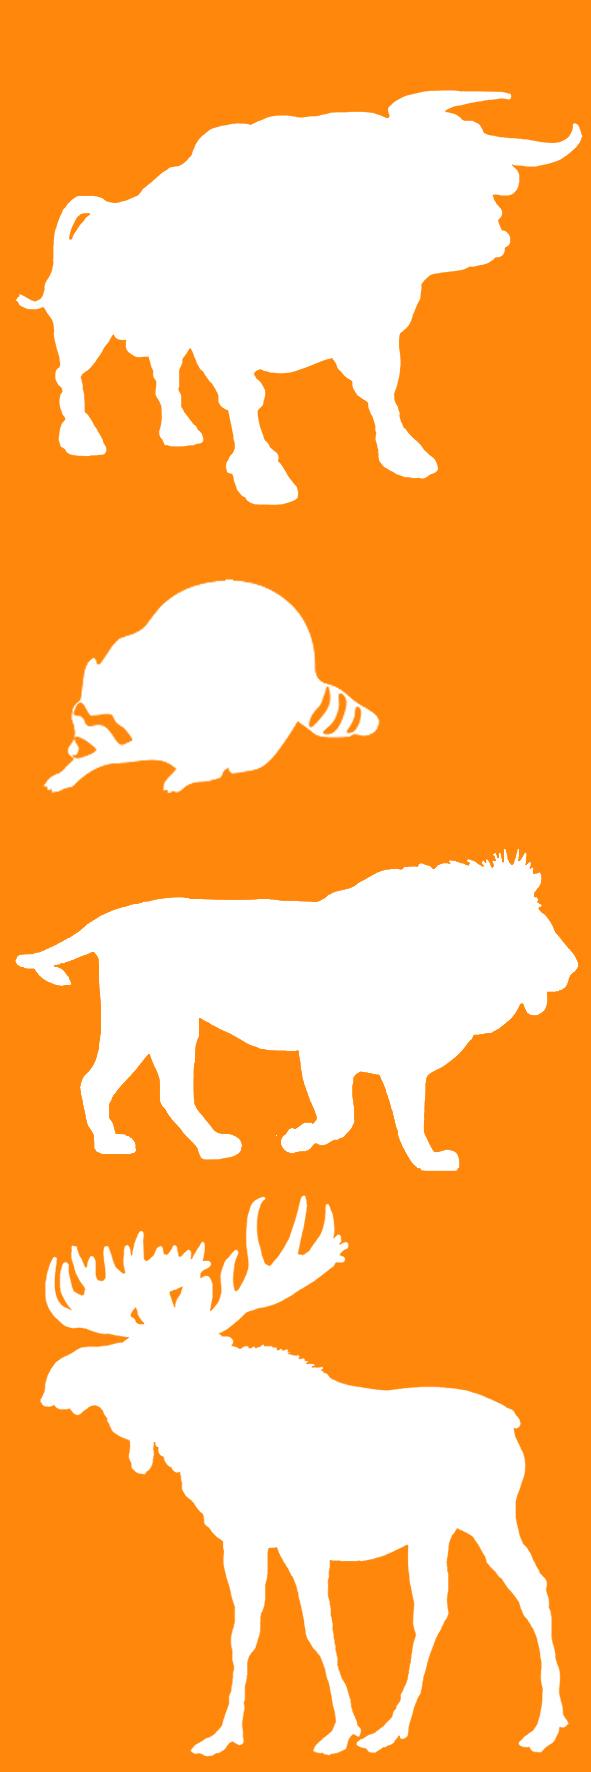 wild animal silhouettes bookmark orange